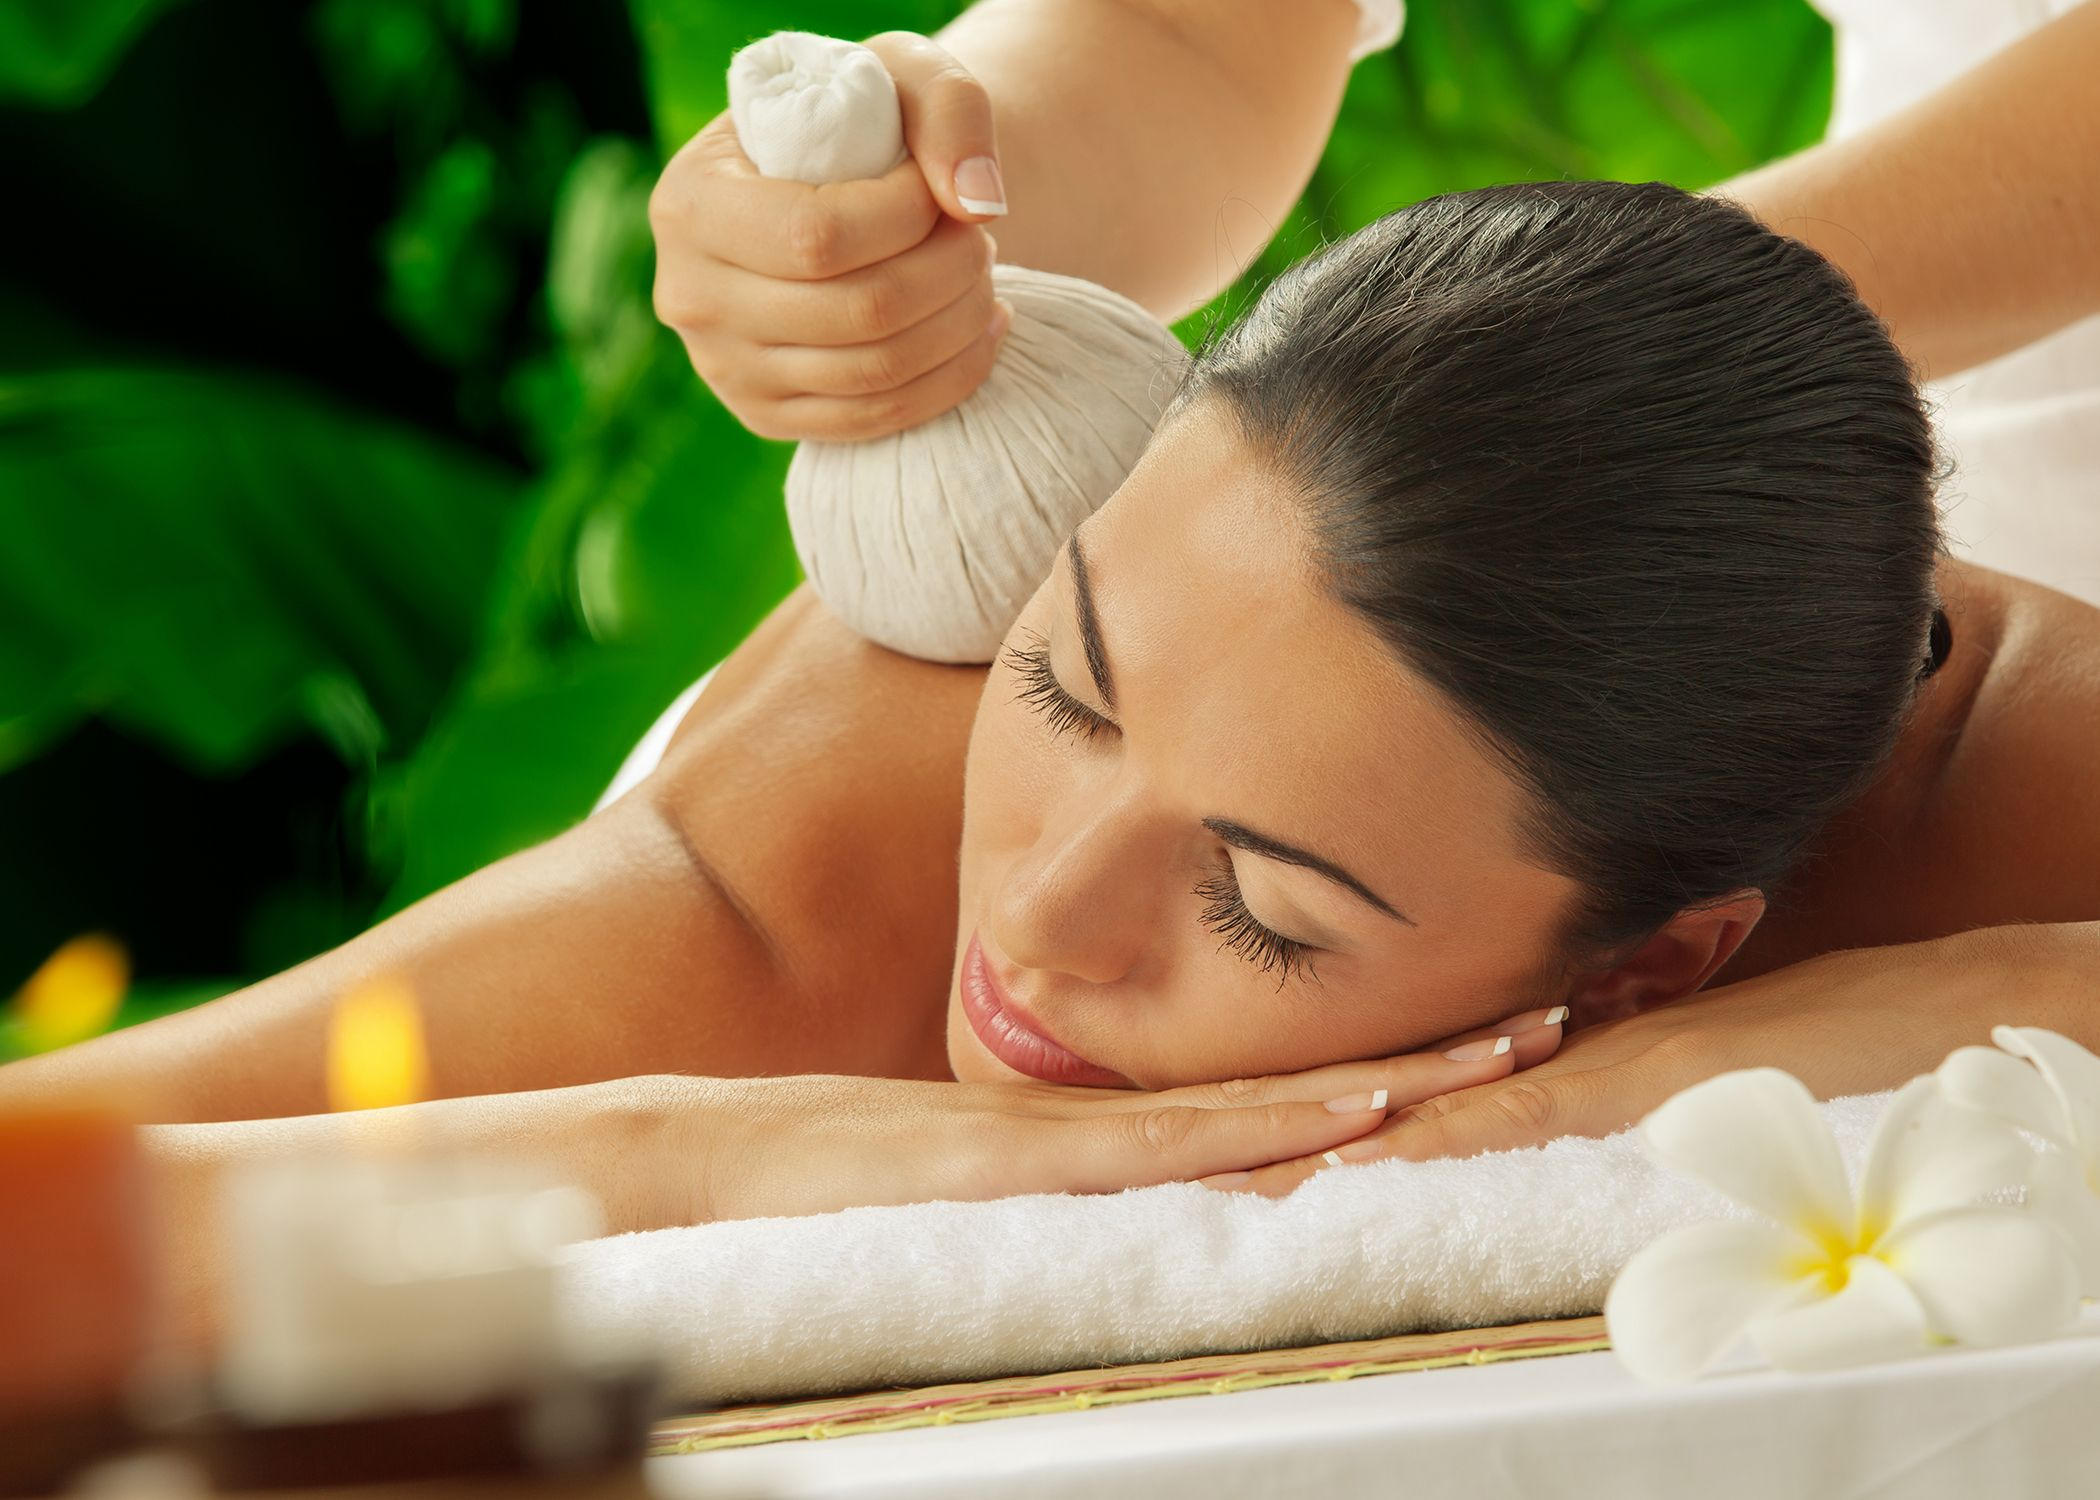 Massage parlor victoria bc